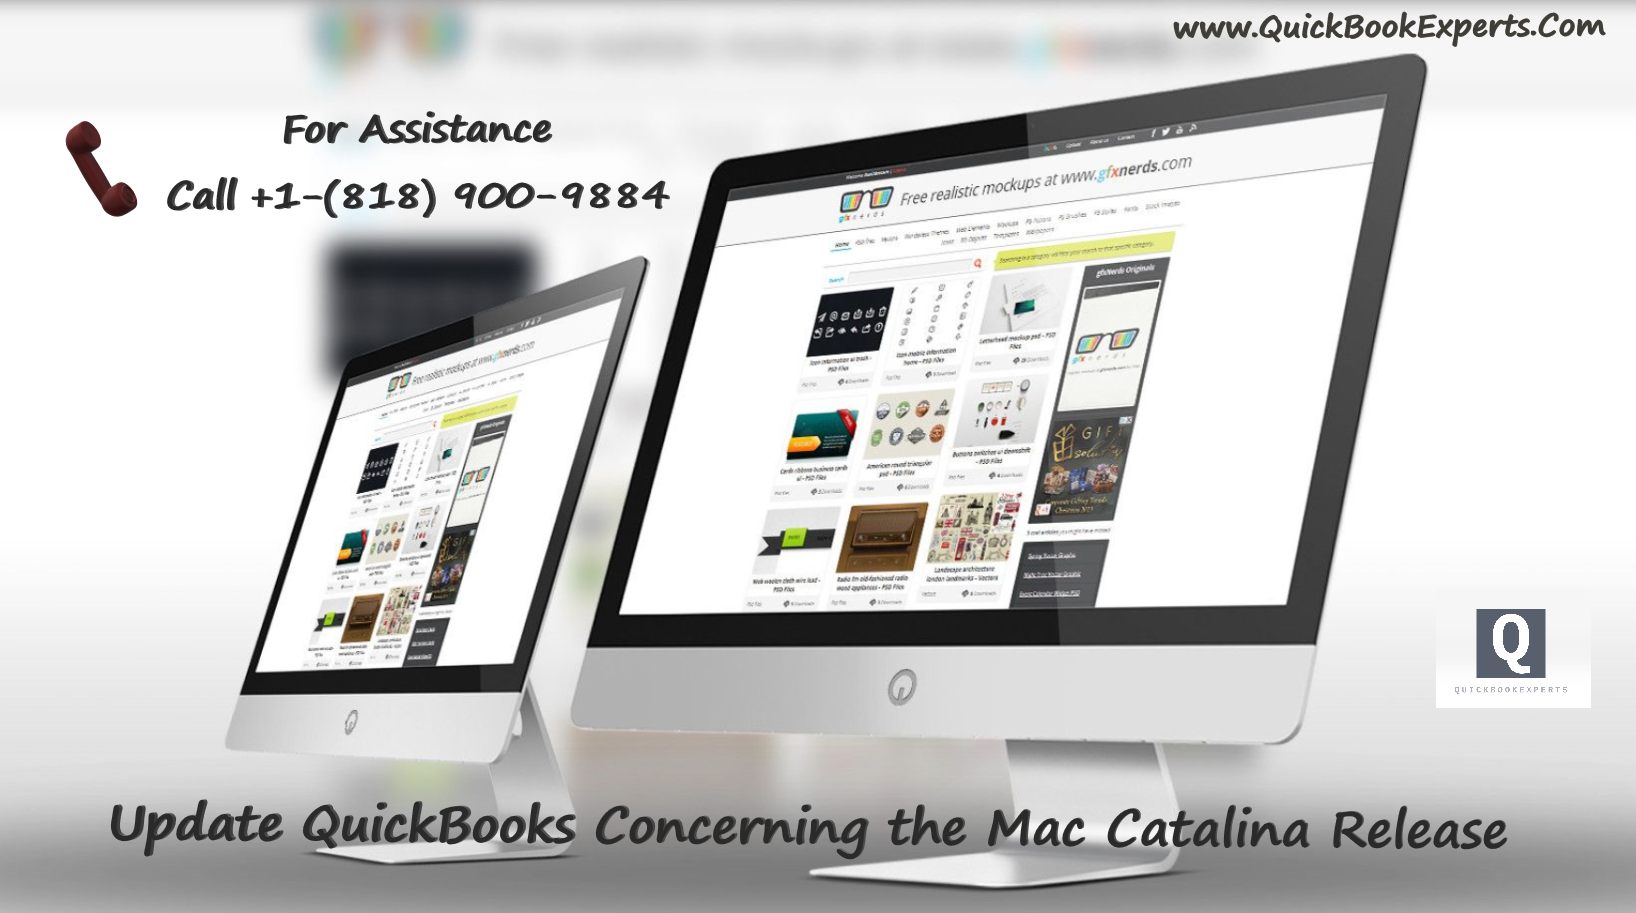 Update QuickBooks Concerning the Mac Catalina Release